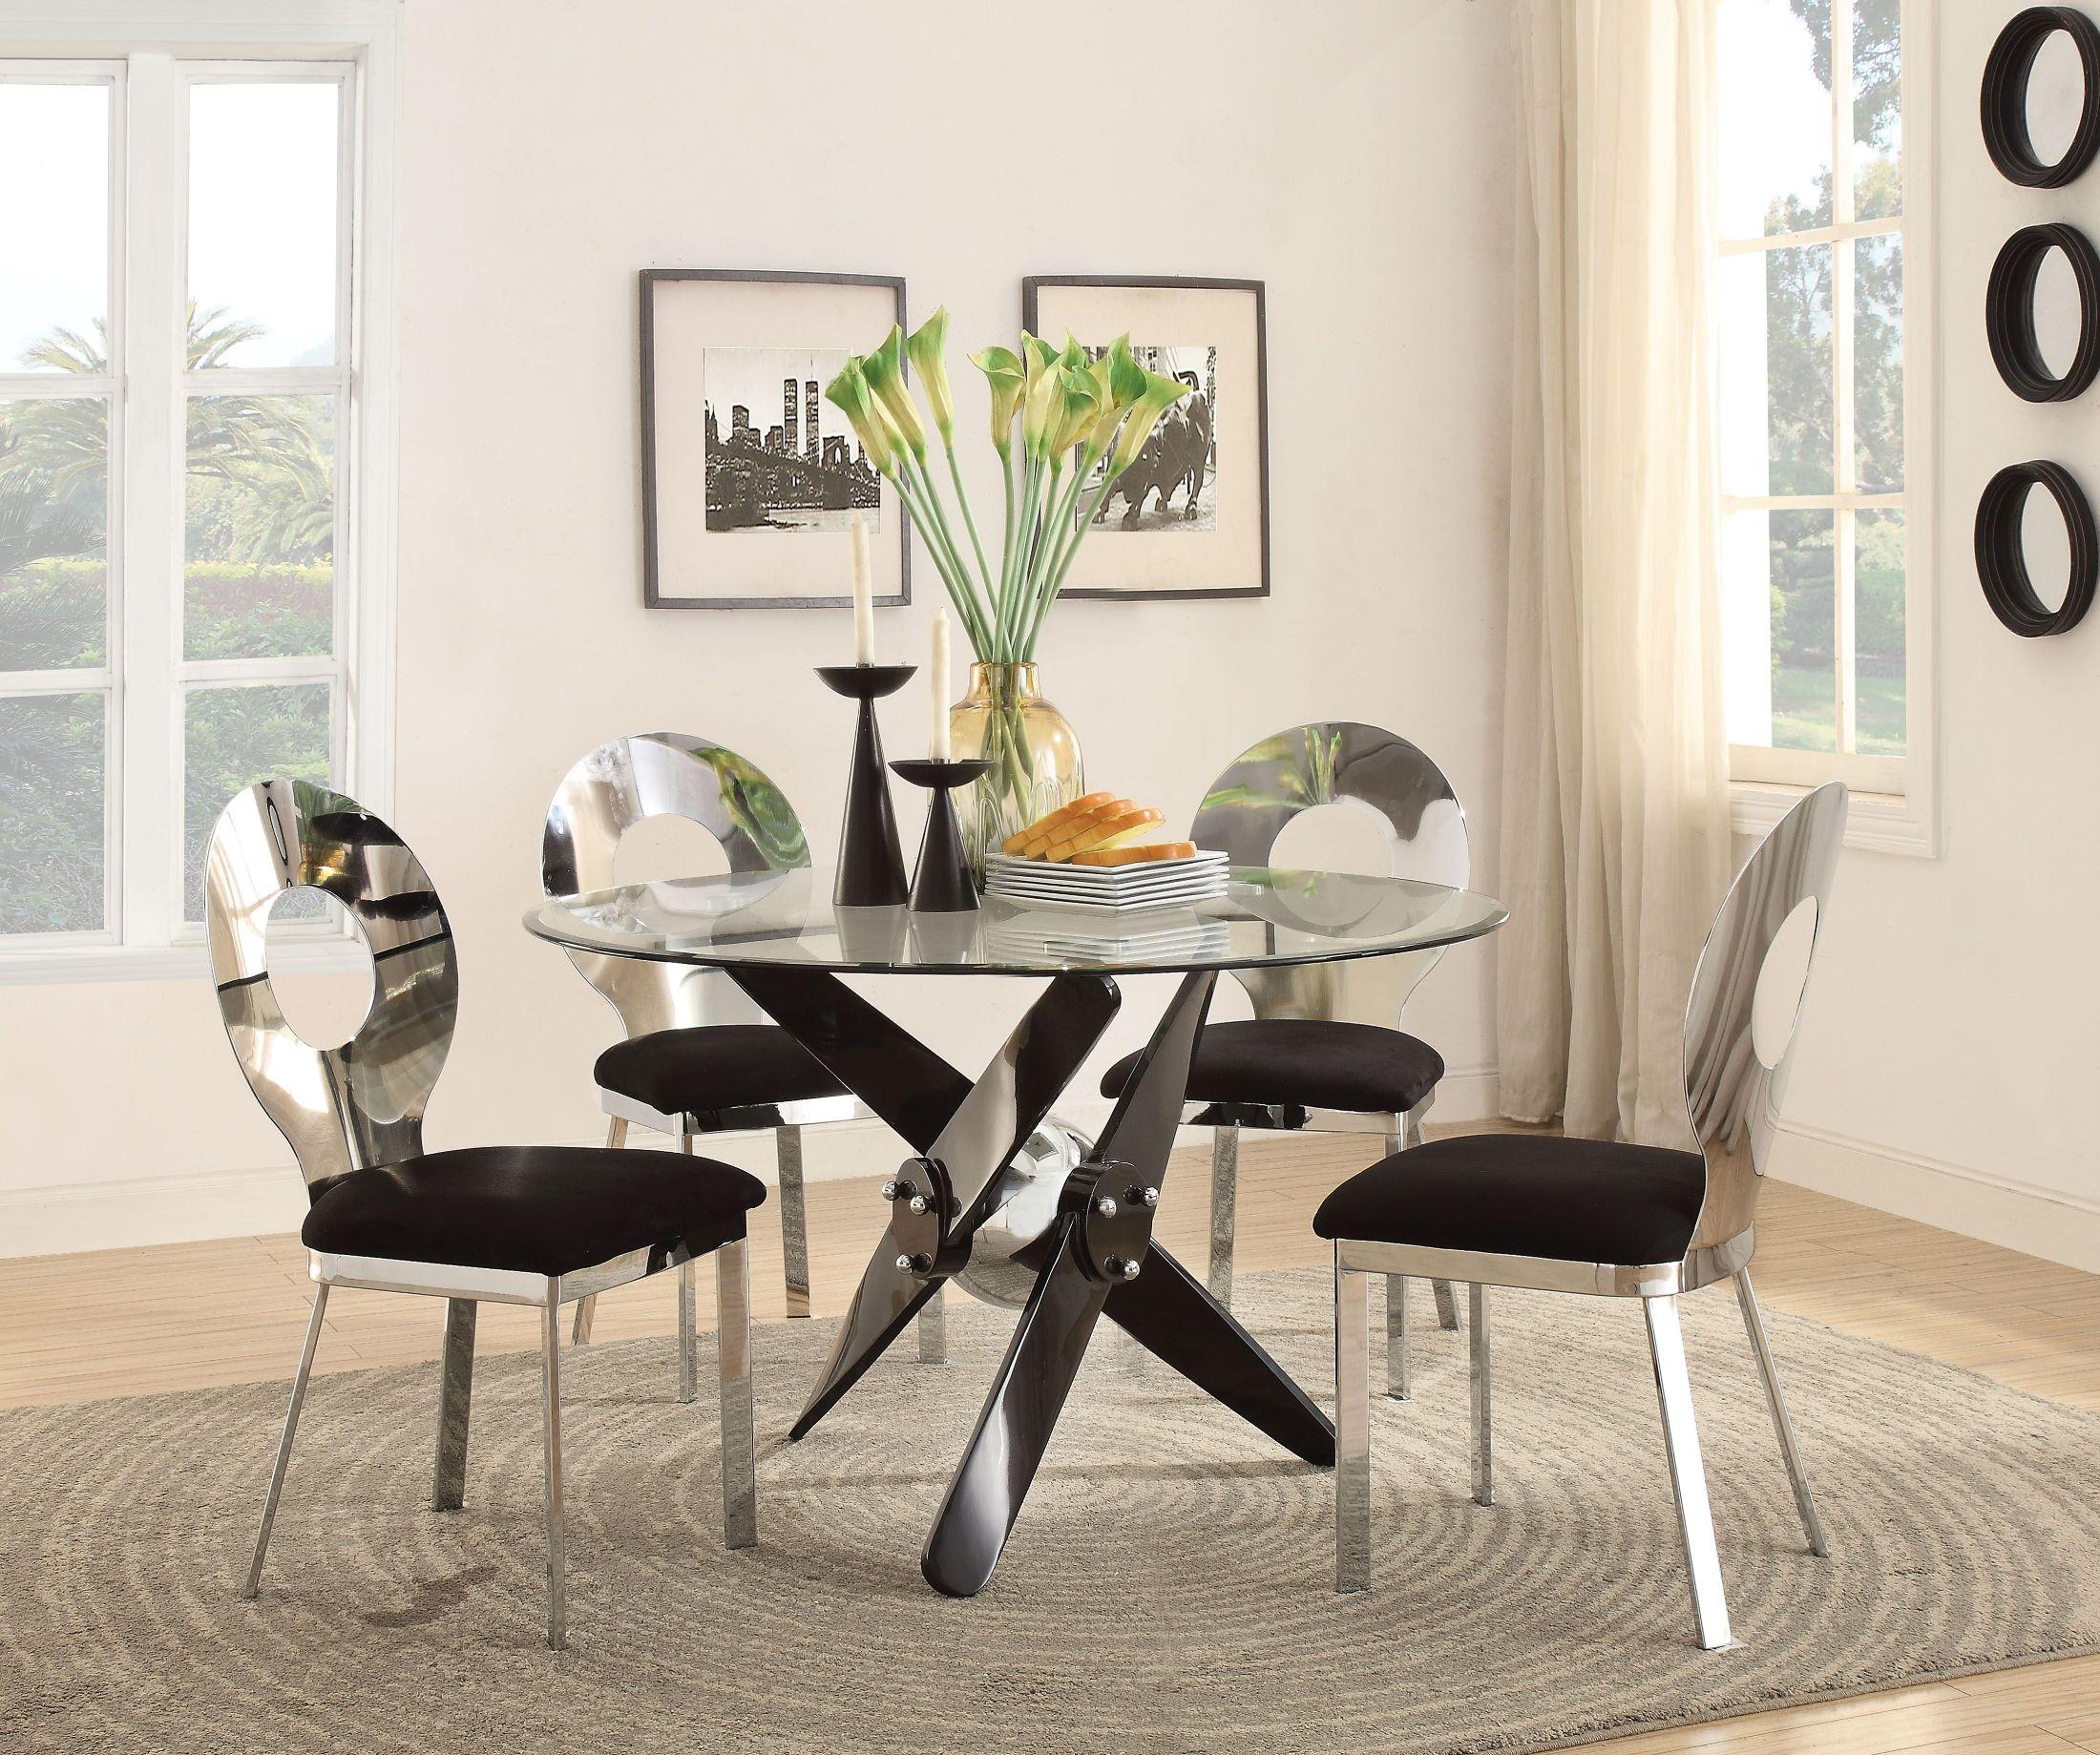 Black Round Dining Set: ACME Hagelin Black Round Dining Room Set